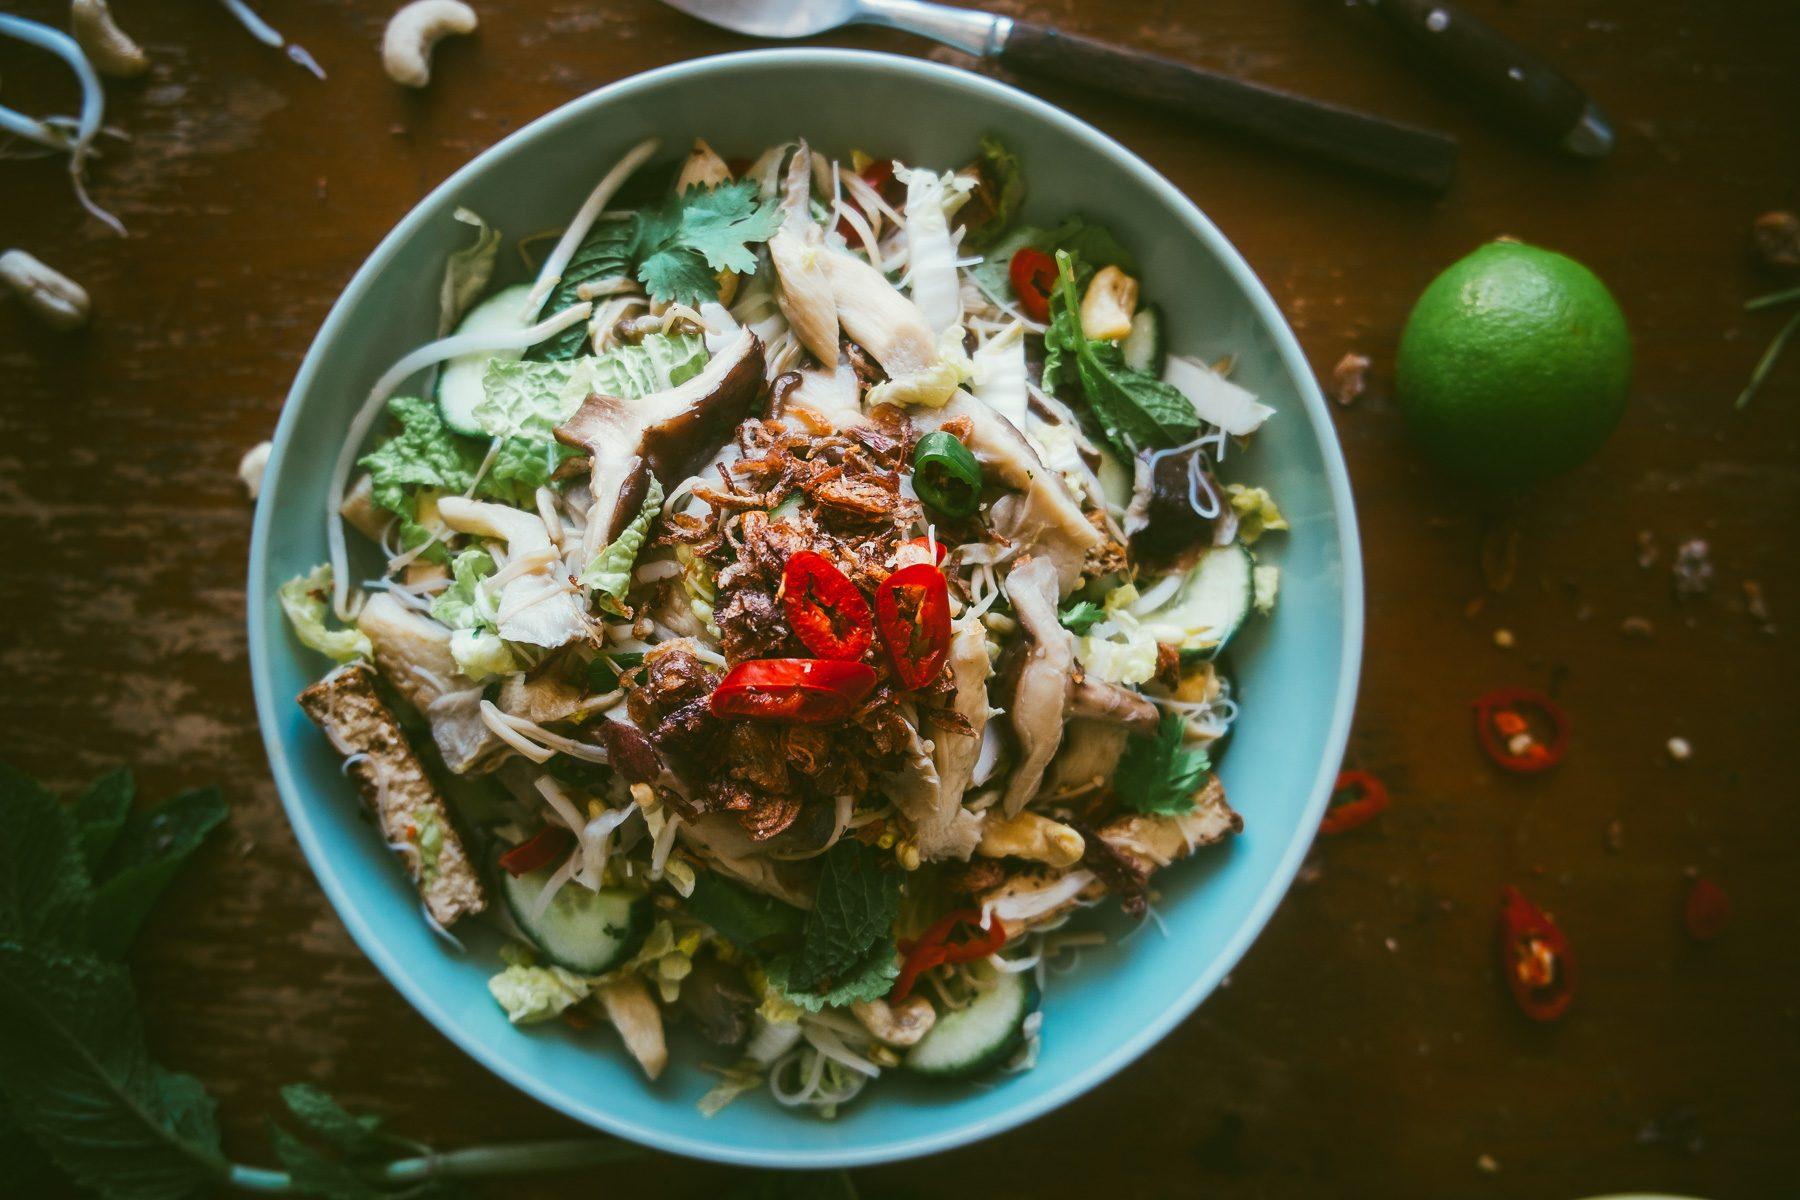 Asian mushroom noodle salad recipe